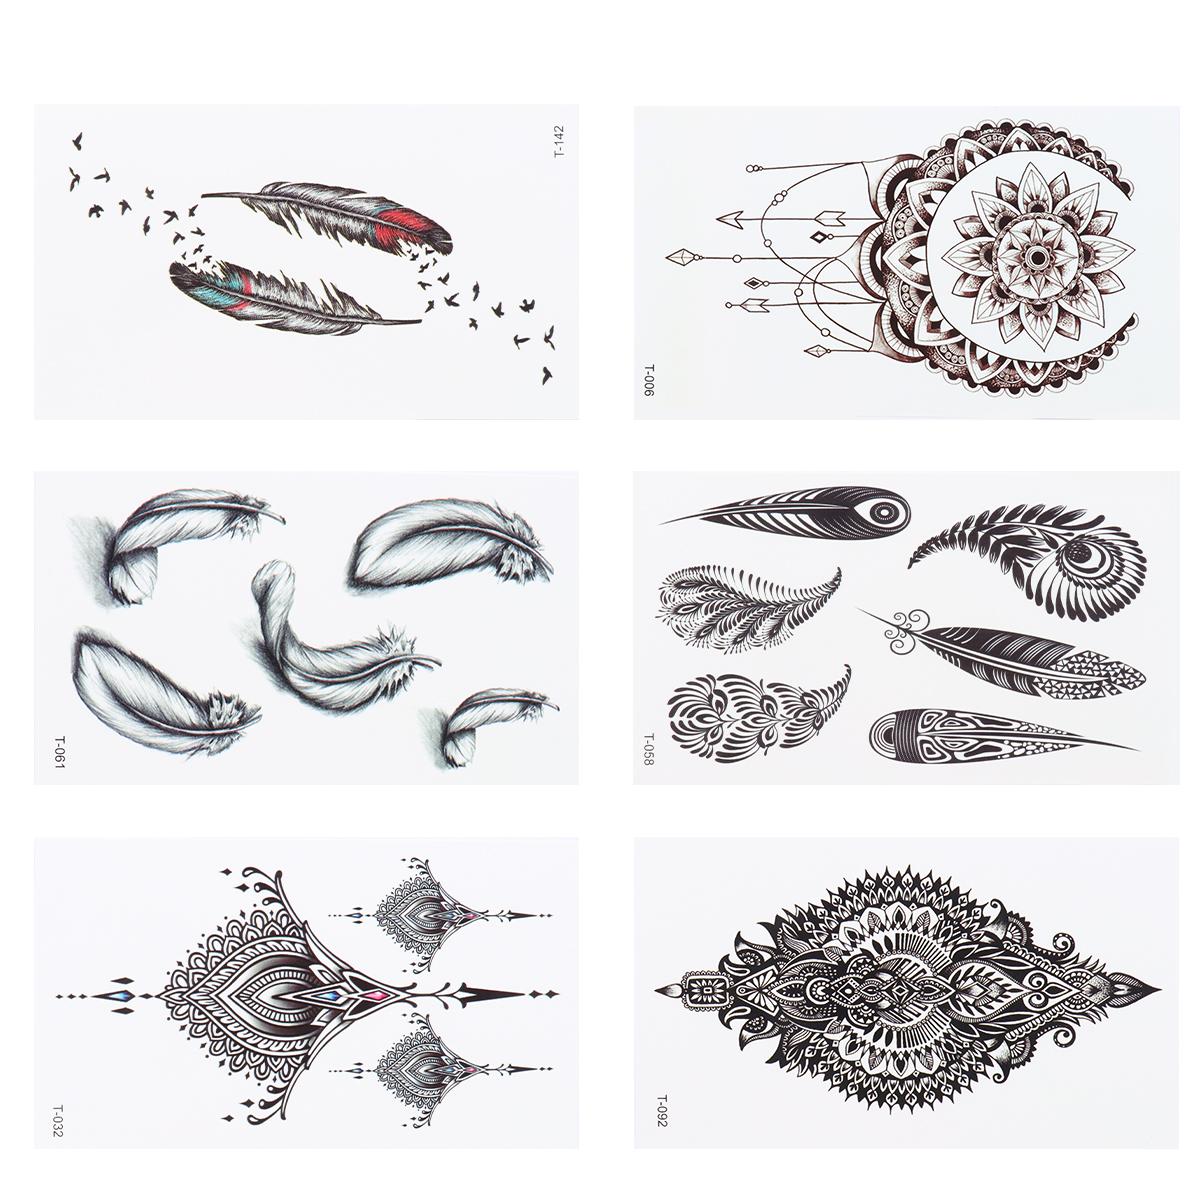 30 pcs Temporary Tattoos Waterproof Black Decorative Mandala Flower Party Favors Body Art Sticker for Women